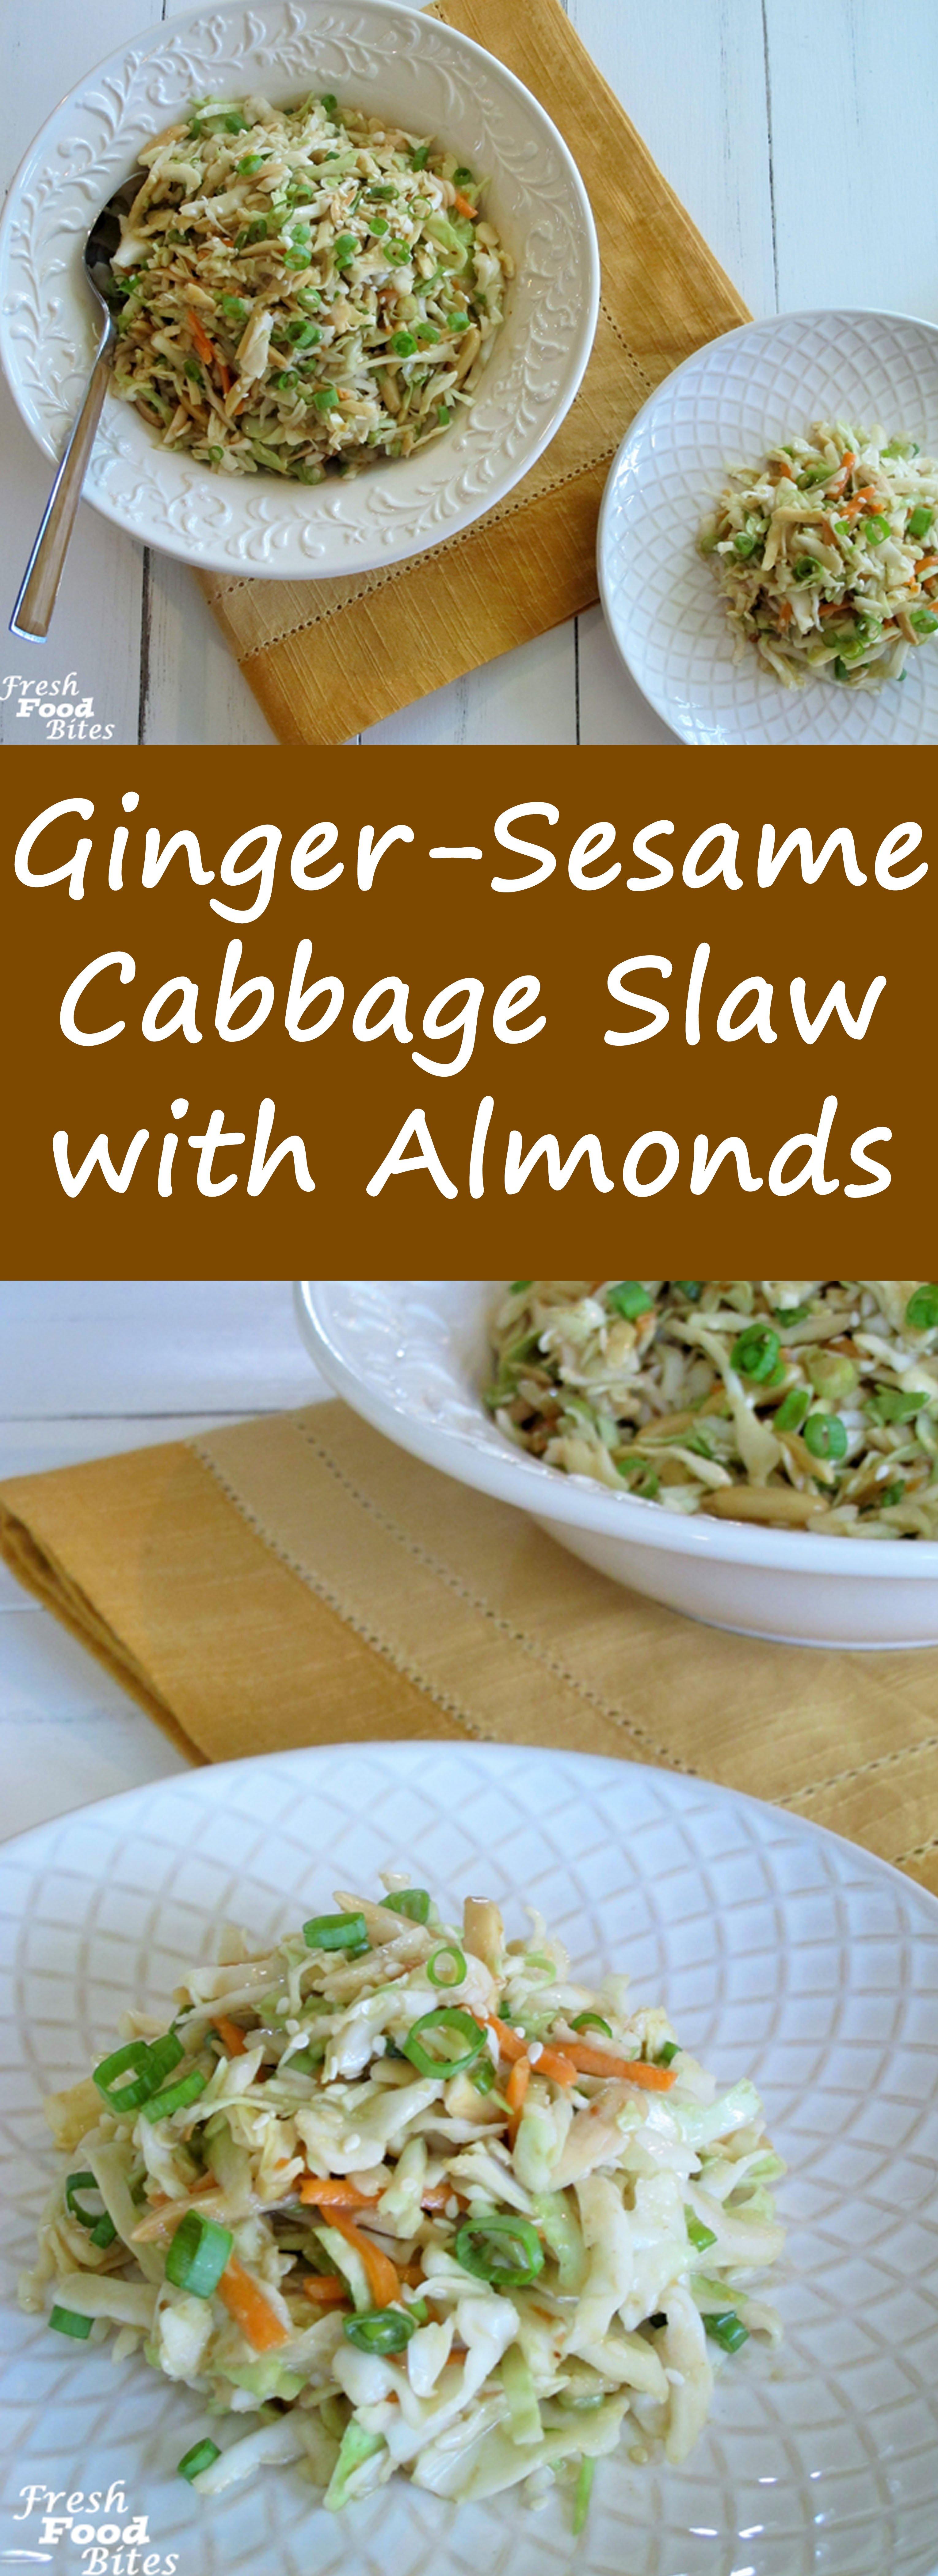 ginger sesame cabbage slaw with almonds fresh food bites